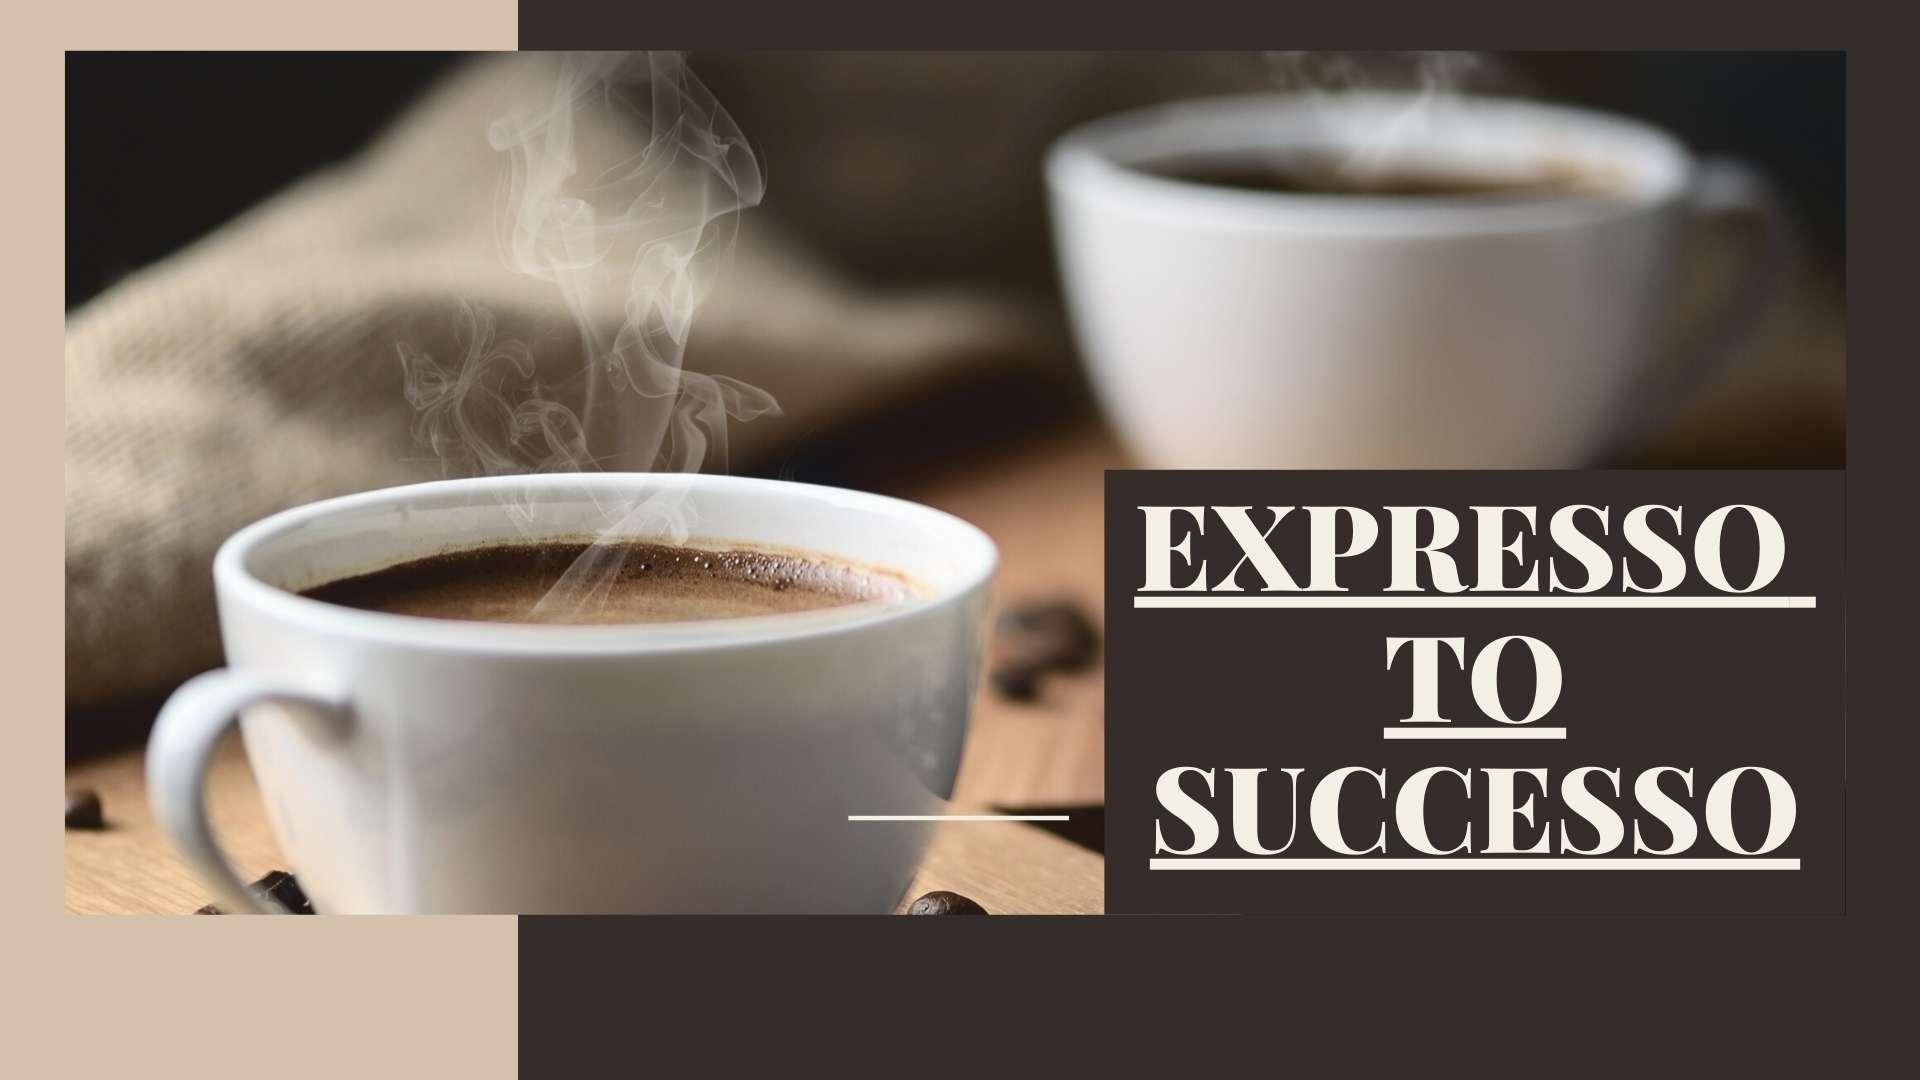 Expresso To Successo